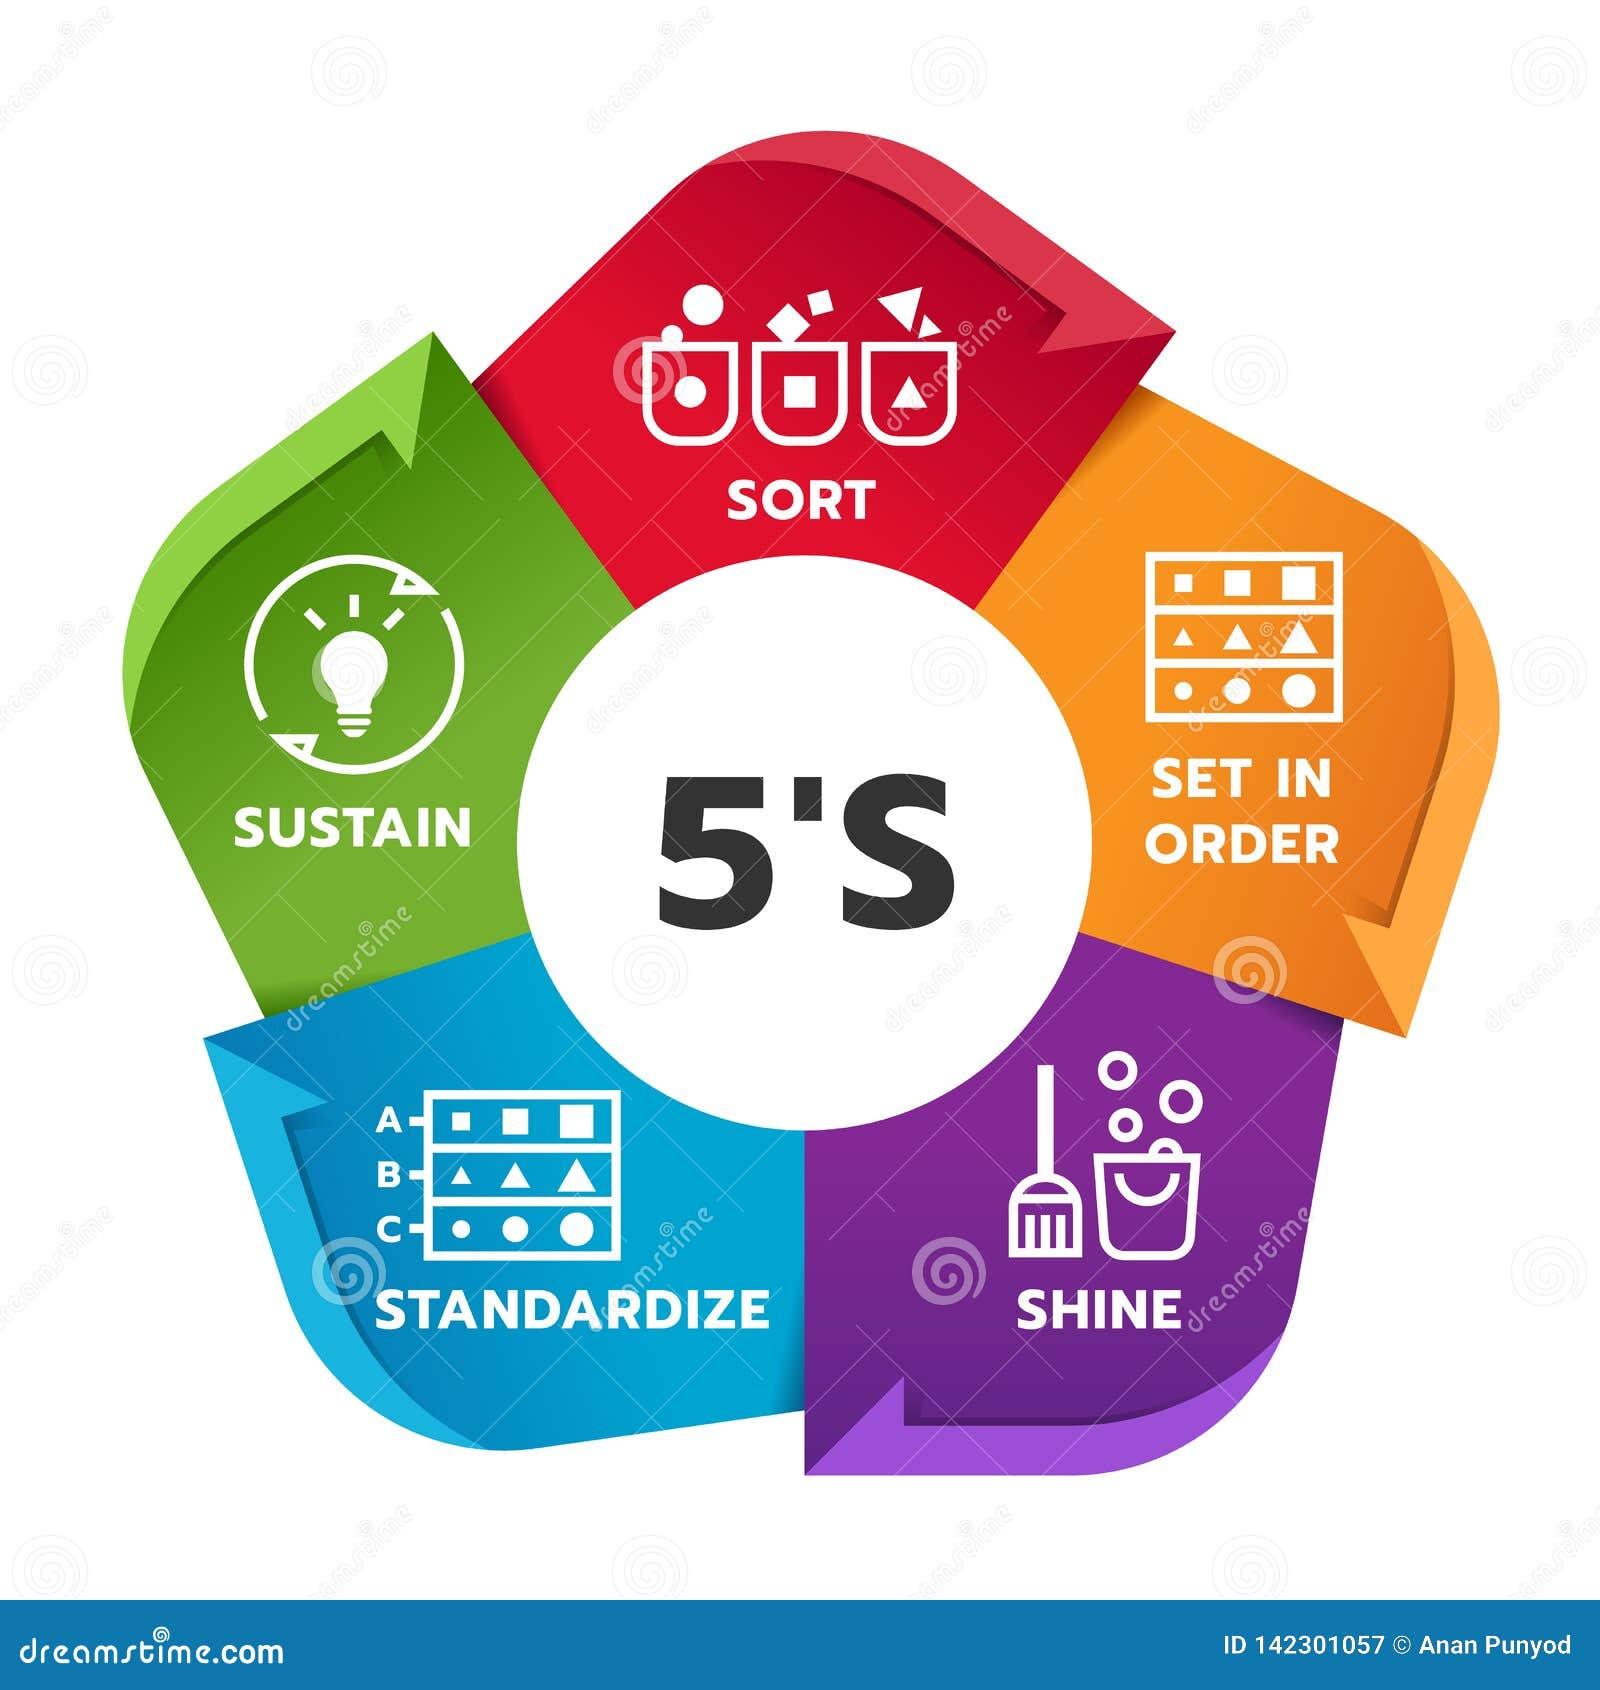 5S Methodology Management Chart Diagram With Sort. Set In